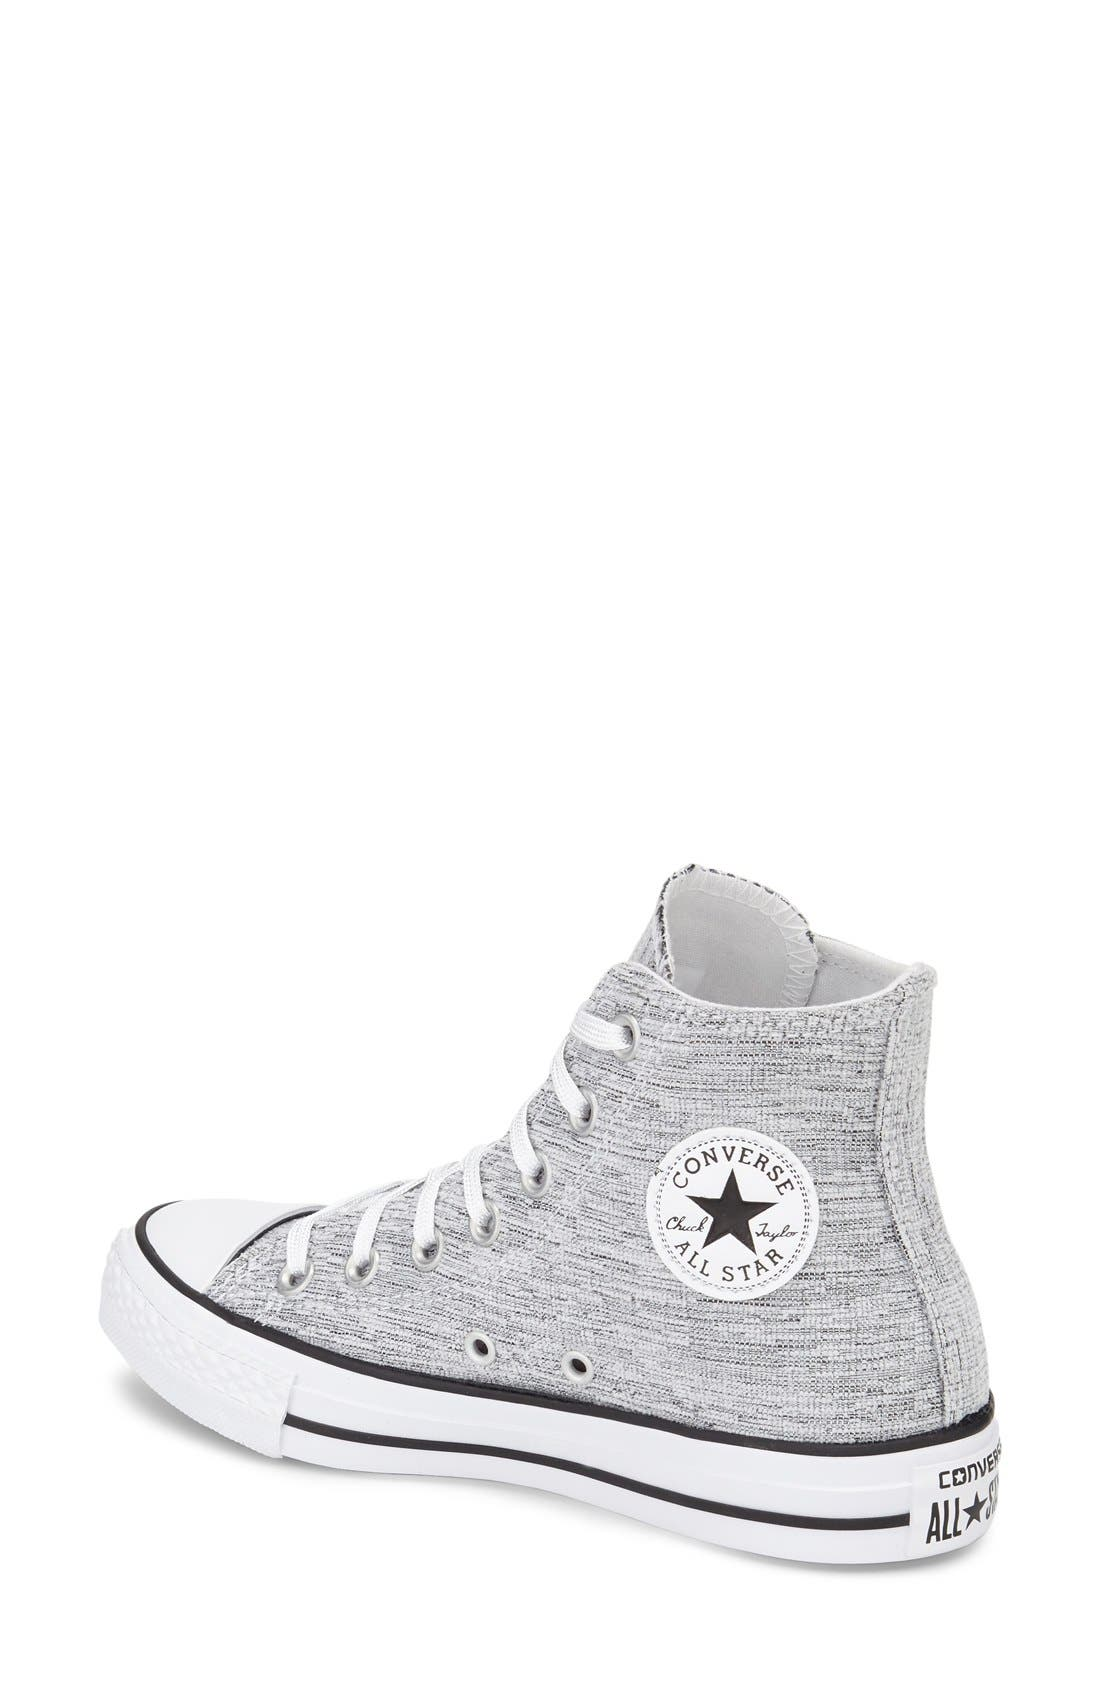 Alternate Image 2  - Converse Chuck Taylor® All Star® Knit High Top Sneaker (Women)